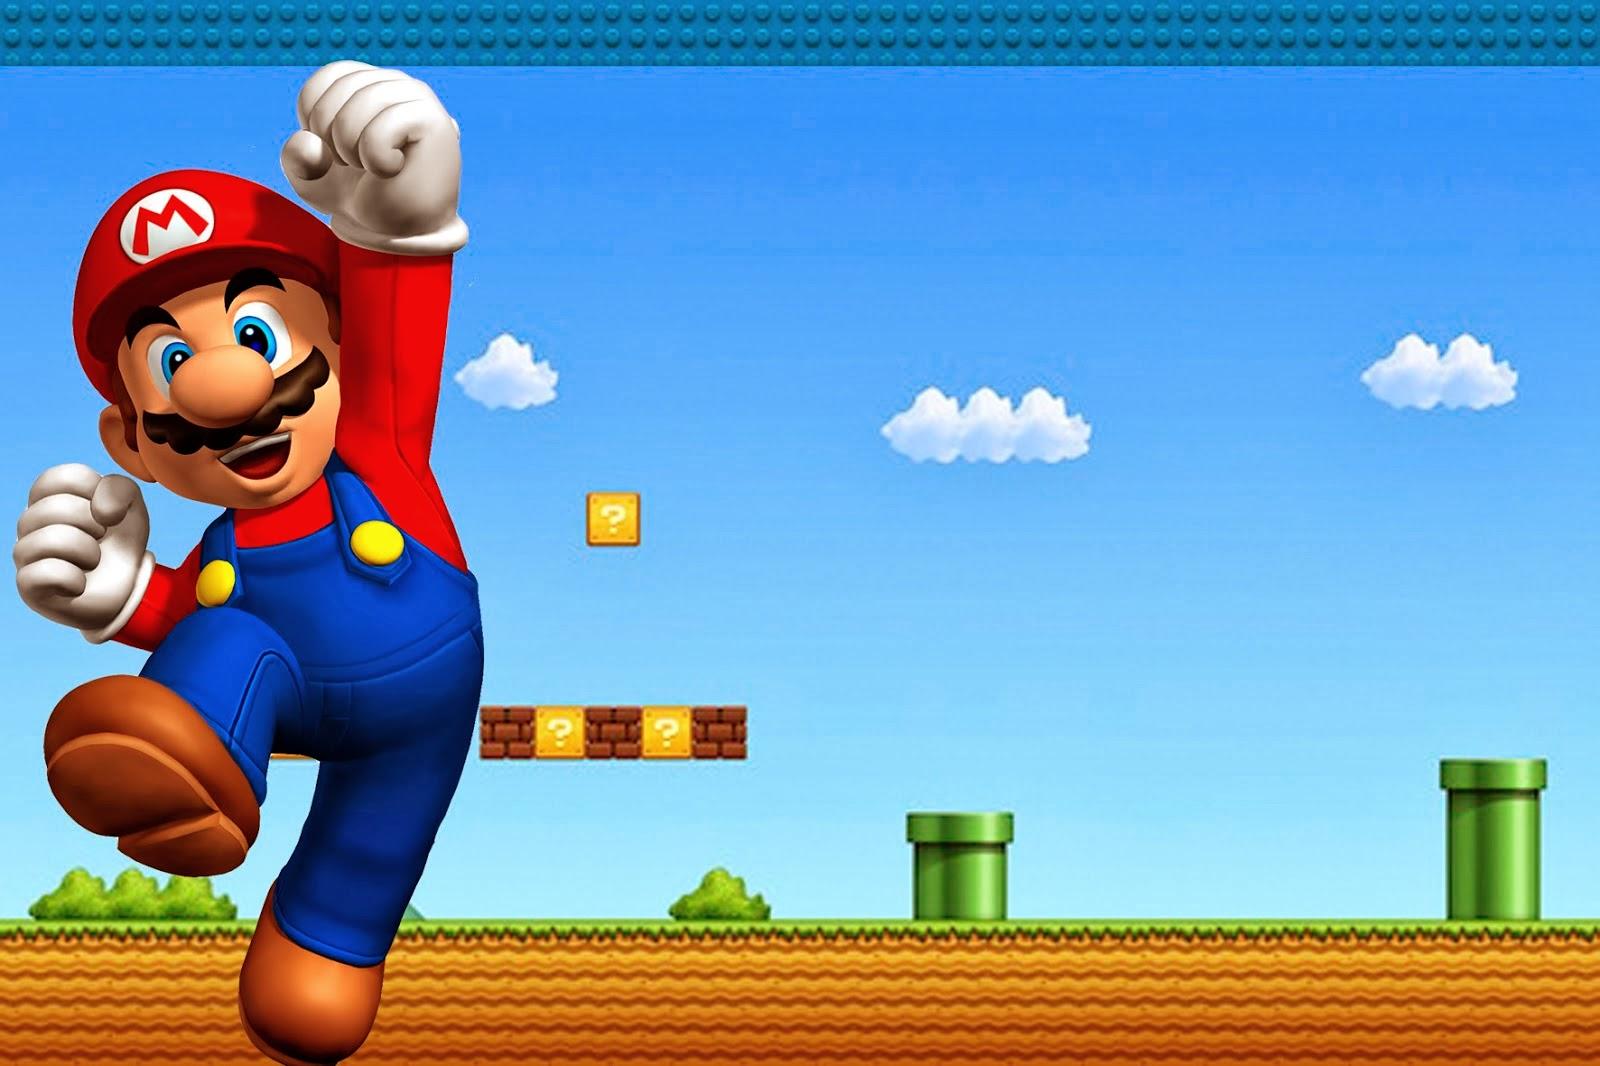 Super Mario Bros Free Party Printables And Invitations. | Oh My - Free Printable Super Mario Bros Invitations